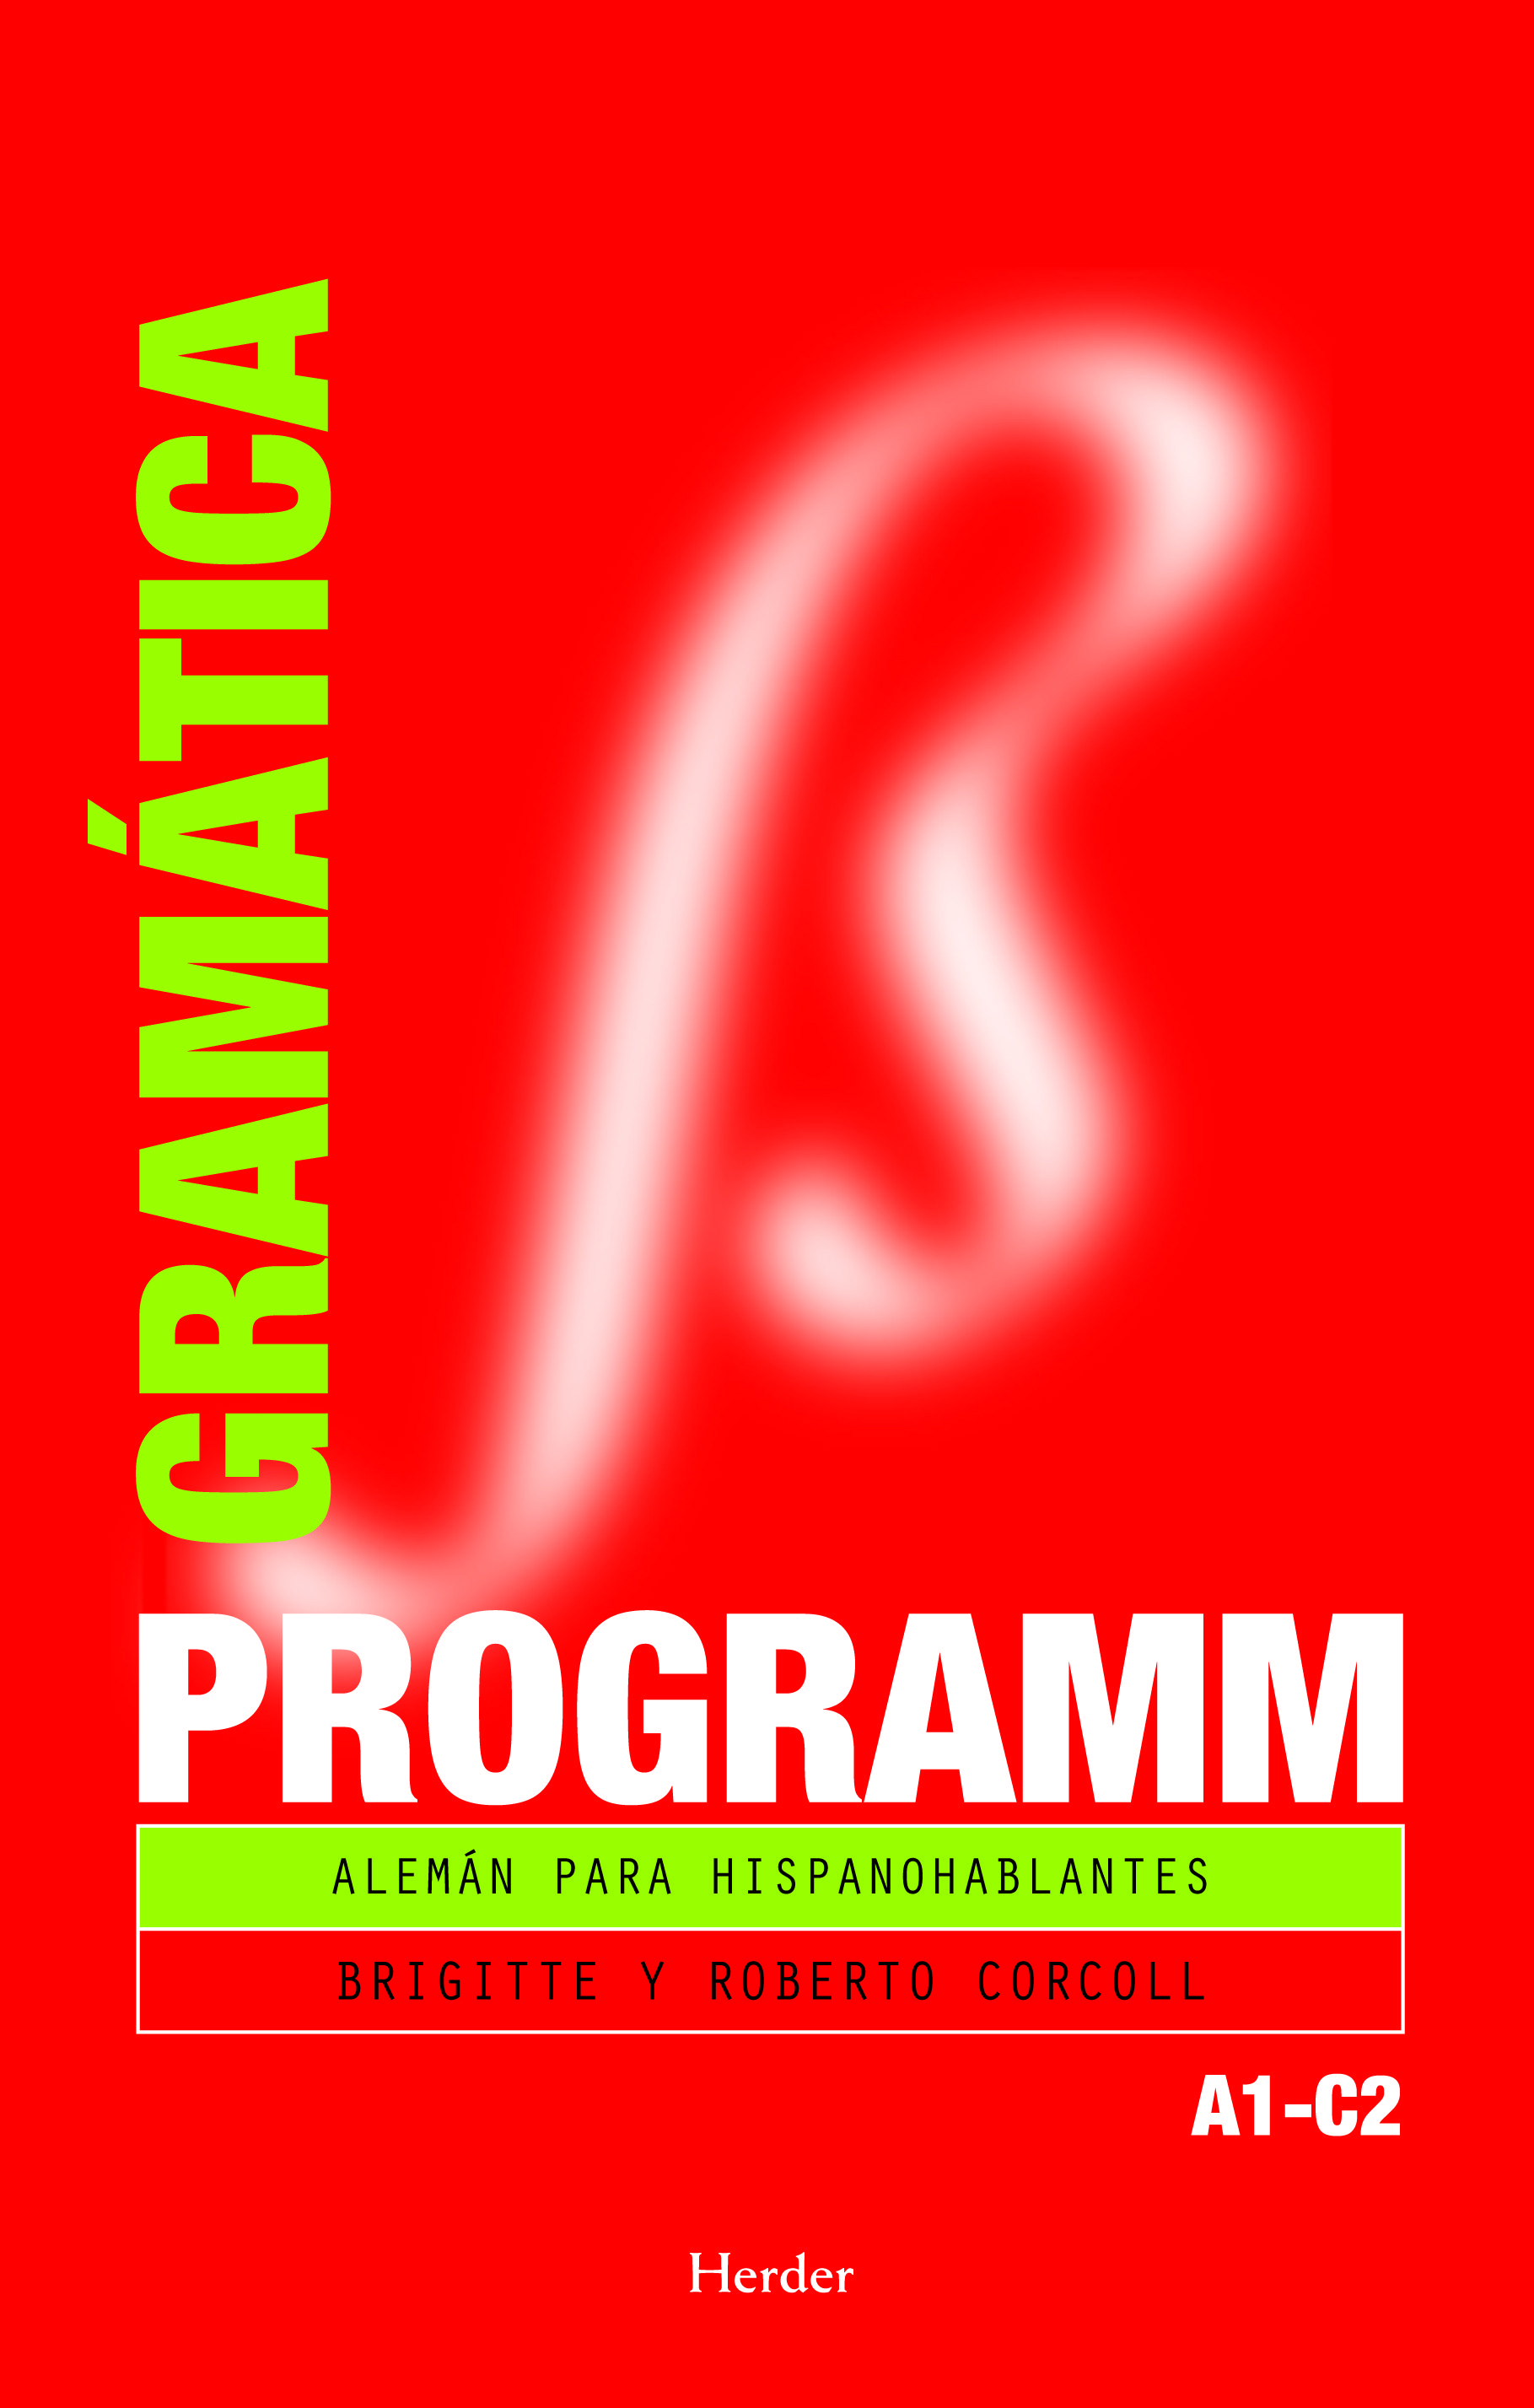 Programm Gramatica: Aleman Para Hispanoablantes - Corcoll Brigitte